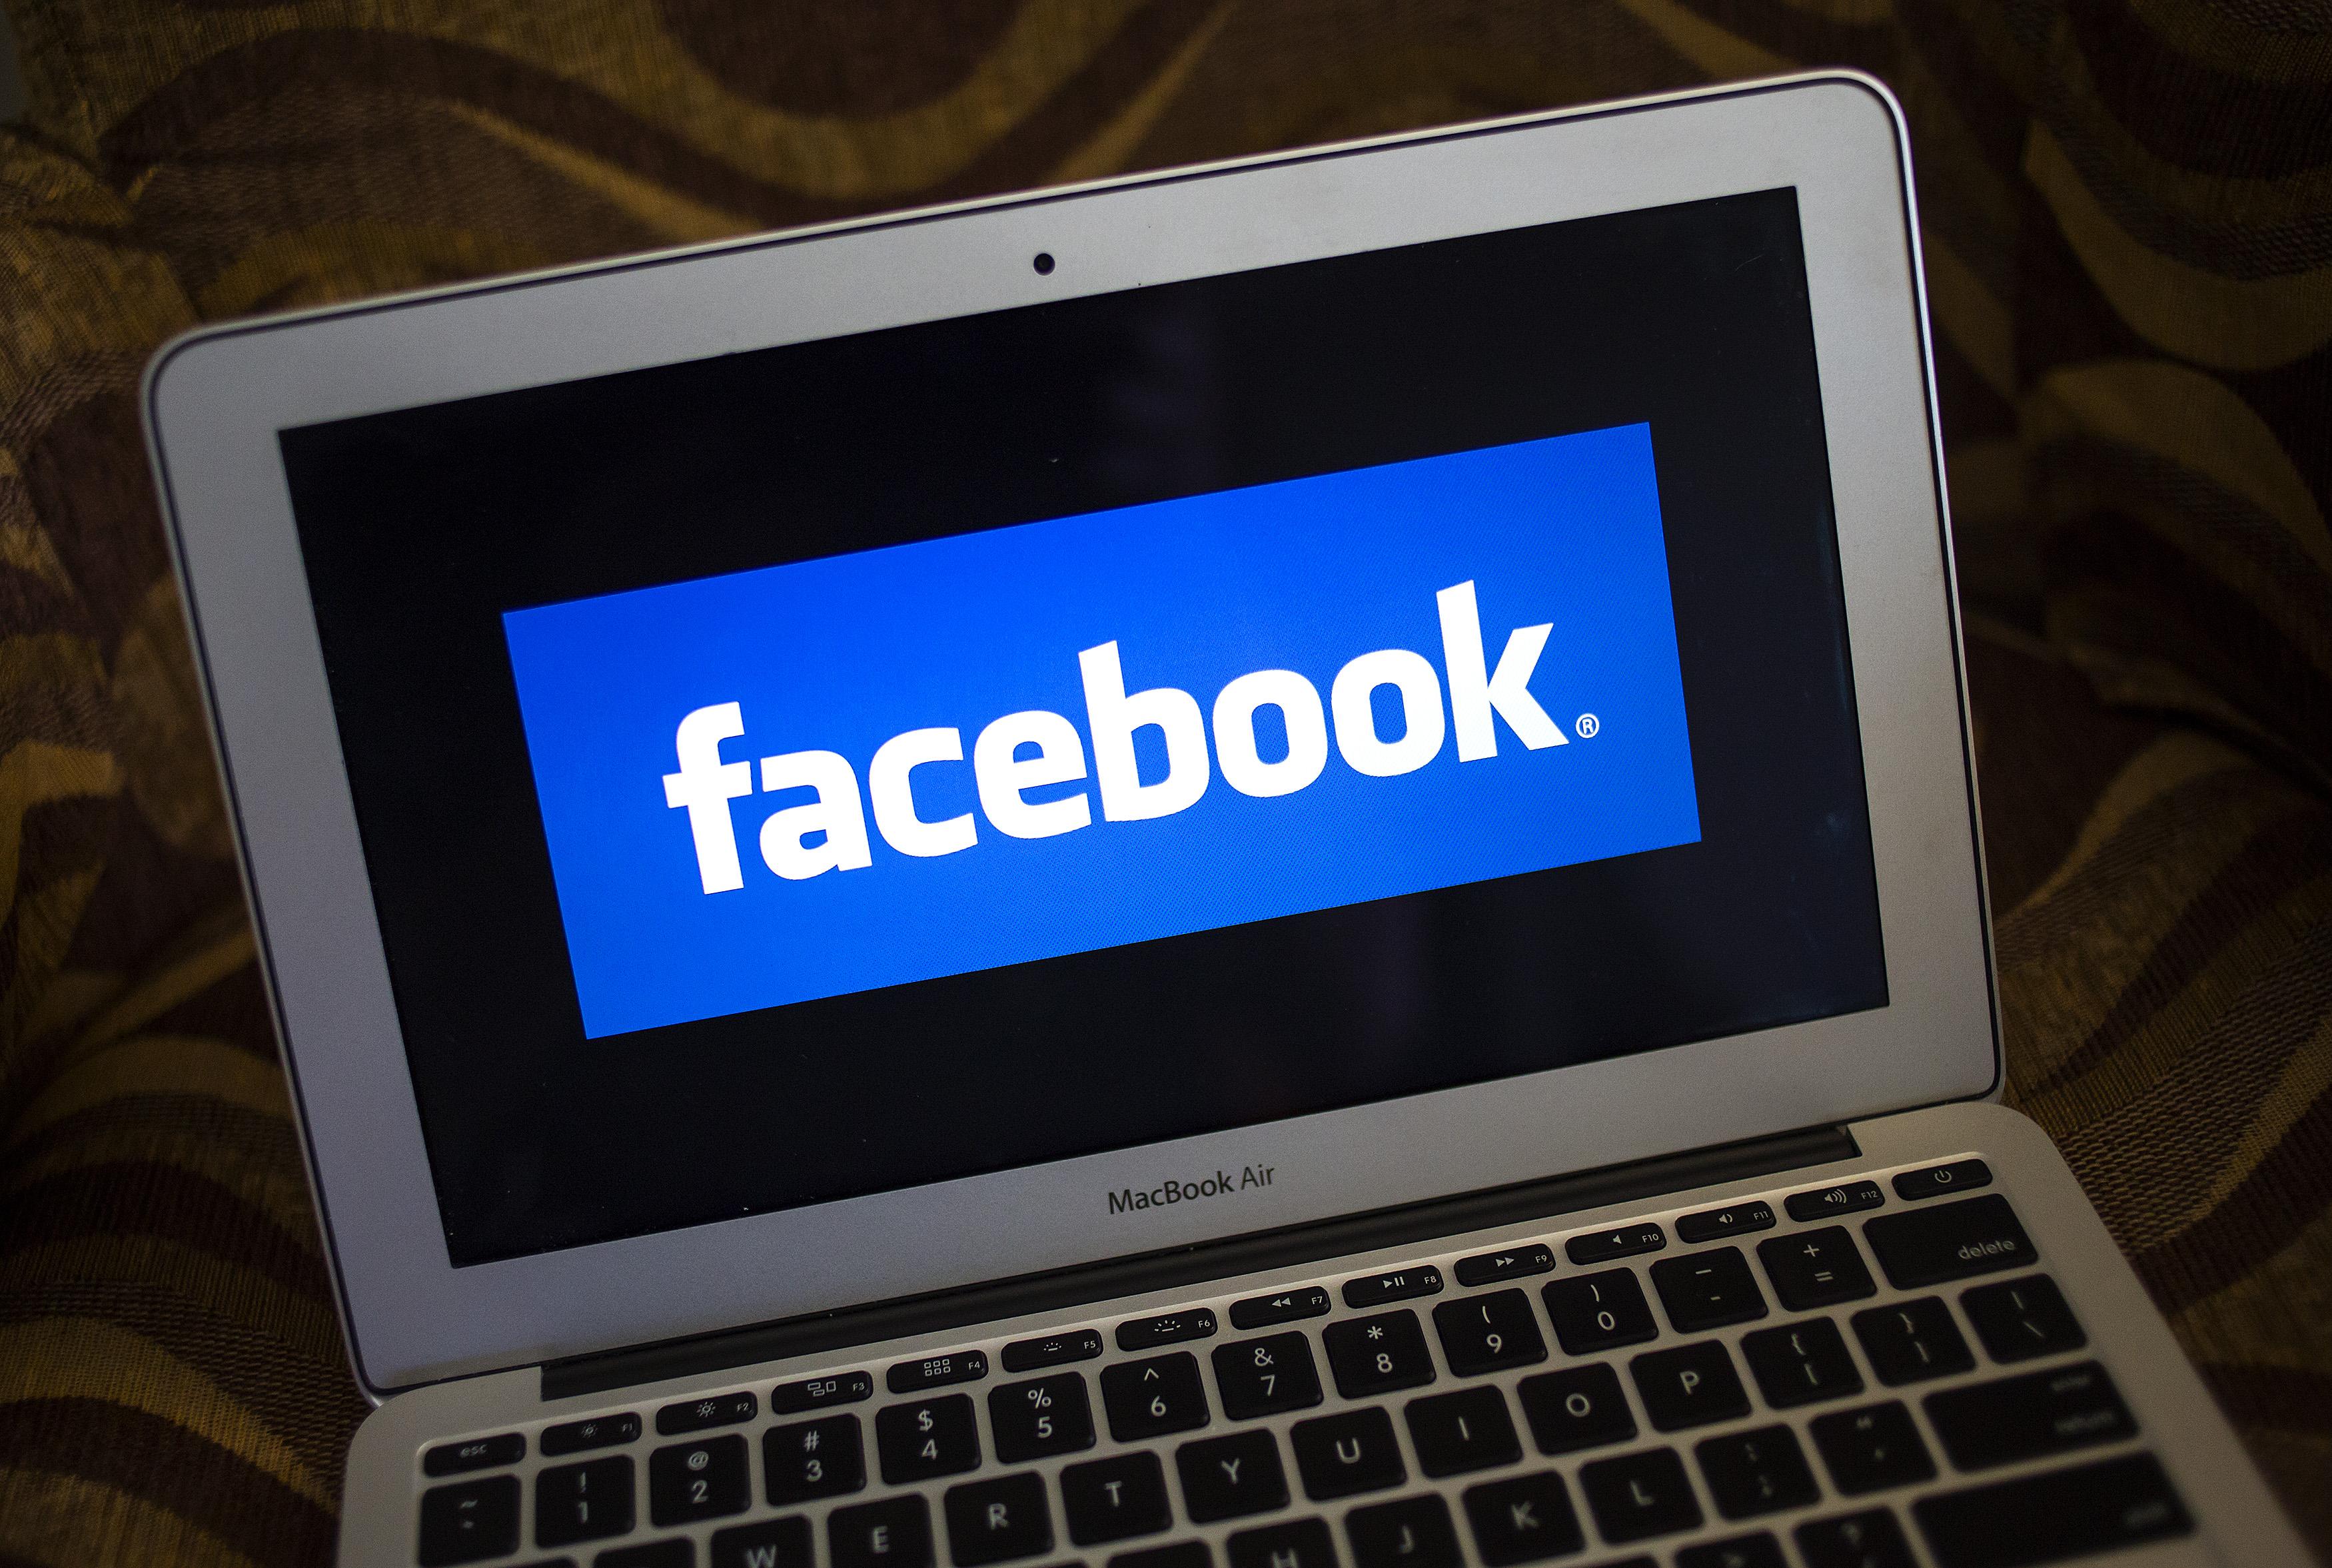 A portrait of the Facebook logo in Ventura, Calif., on Dec. 21, 2013